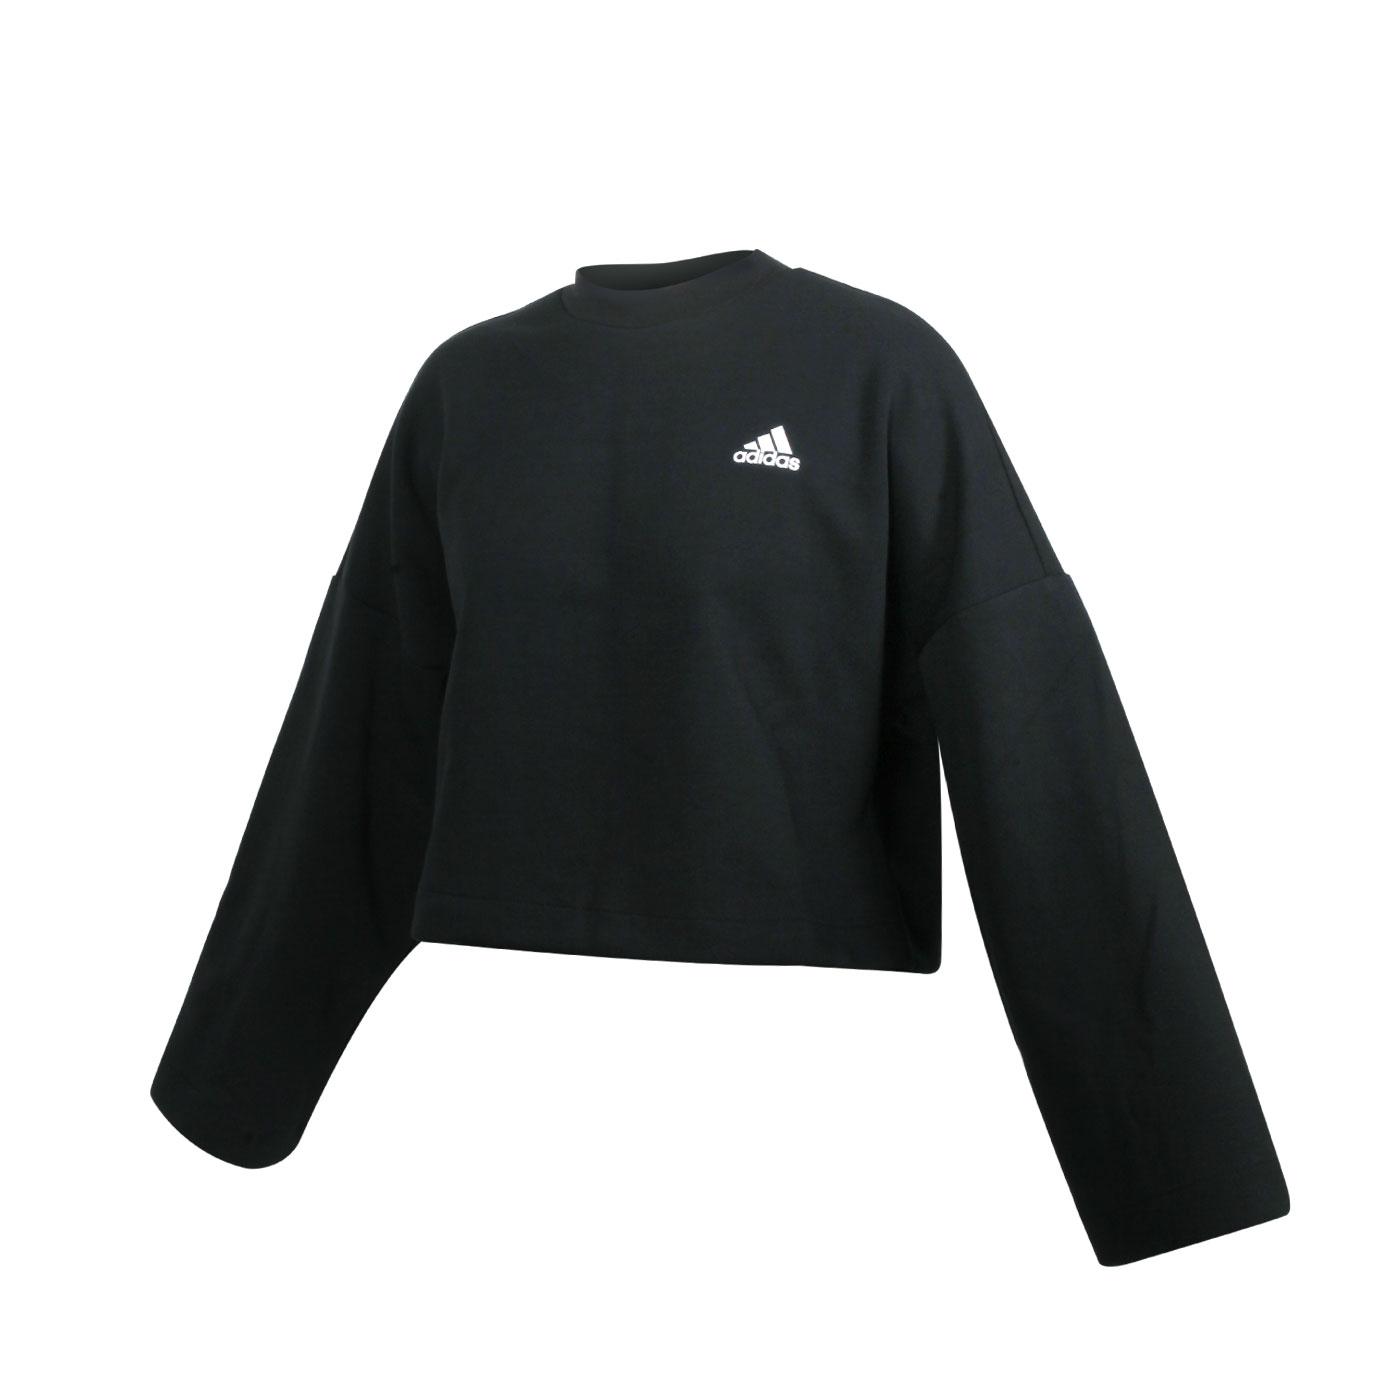 ADIDAS 女款長袖T恤 GC6943 - 黑白